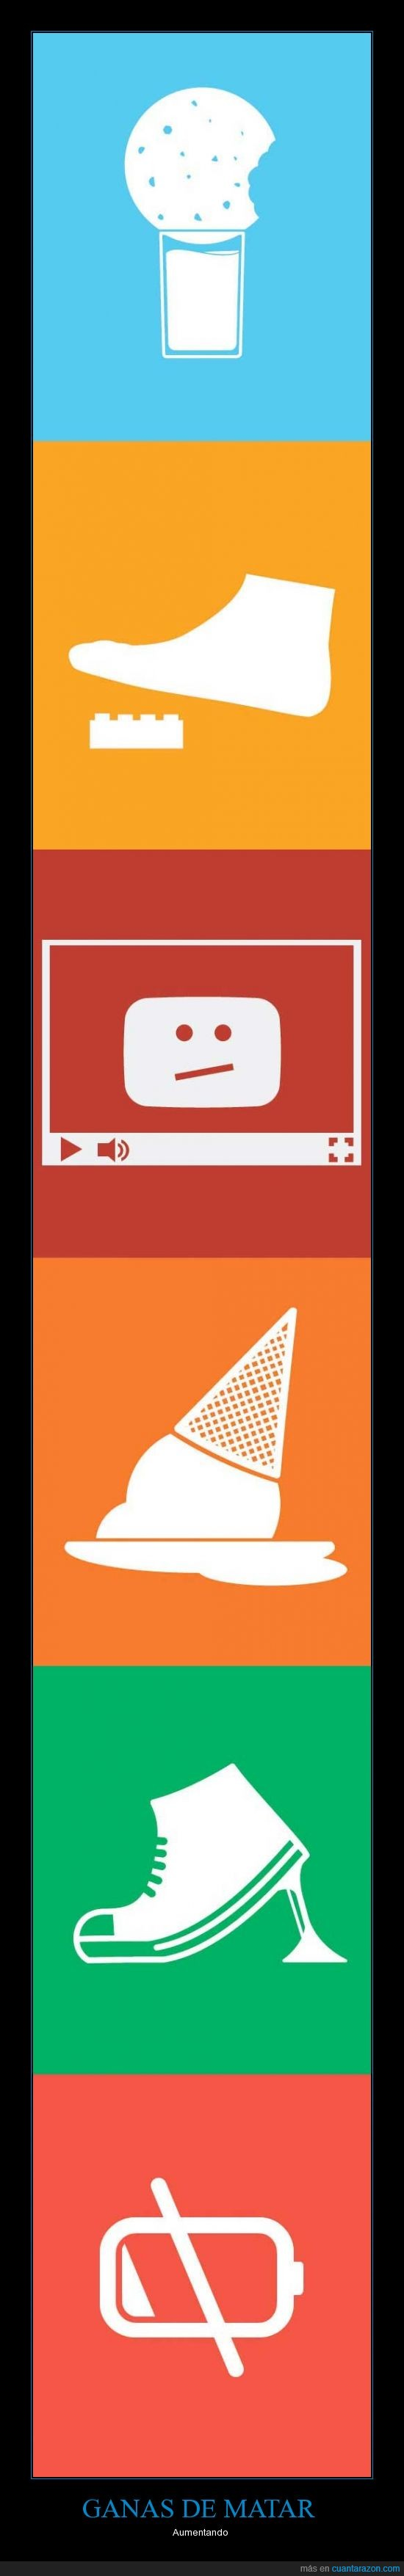 bateria,chicle,galleta,helado,leche,pisar,youtube